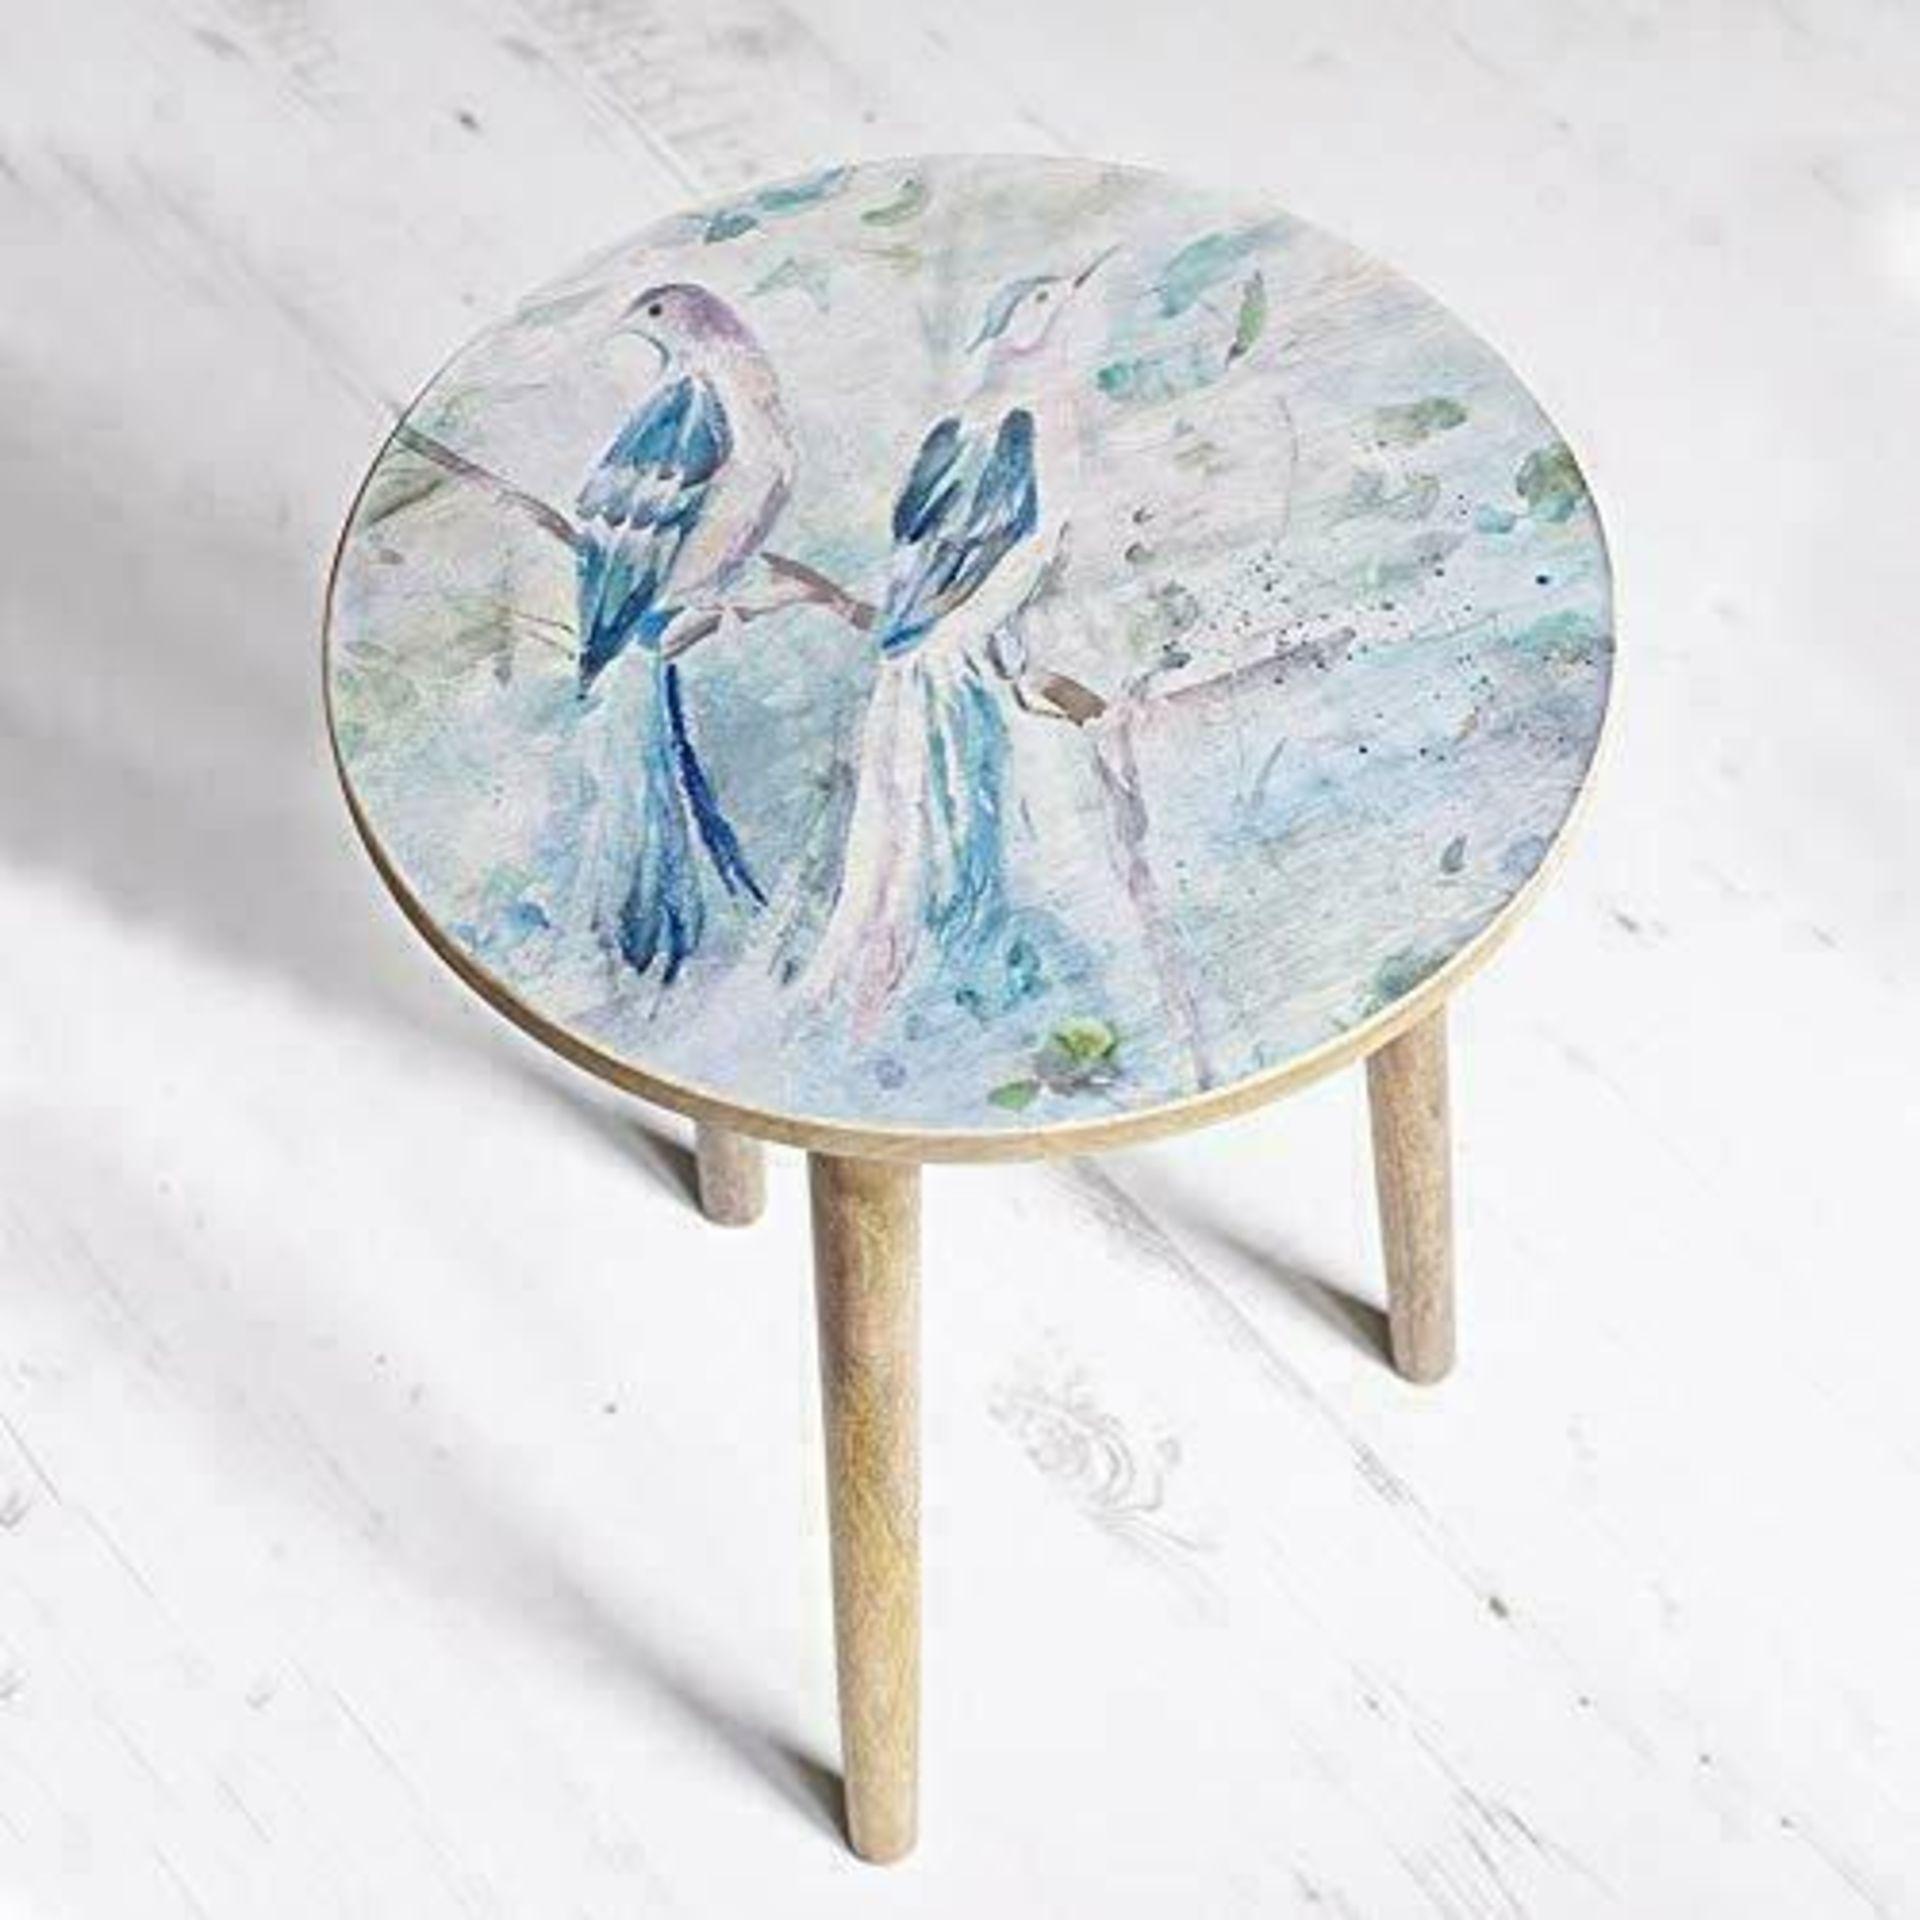 Voyage Maison Rotunda Small Table Arabella